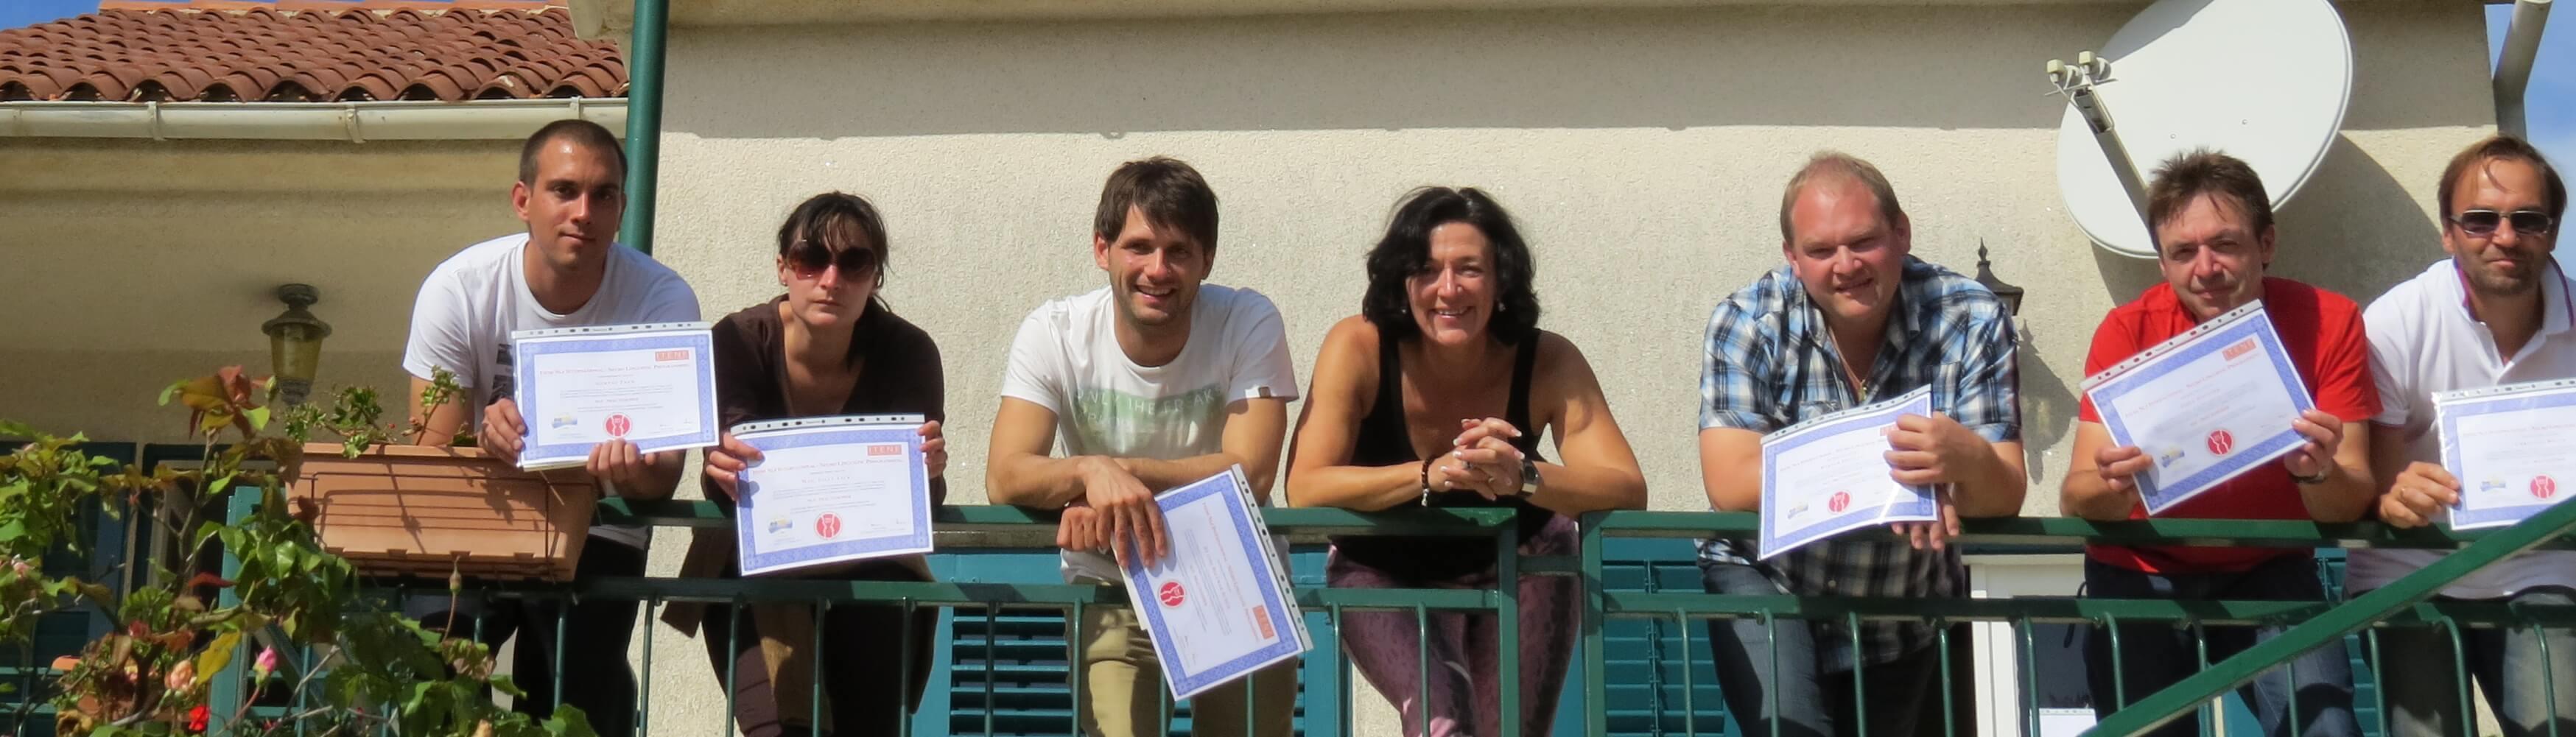 Practitionergruppe mit Diplom